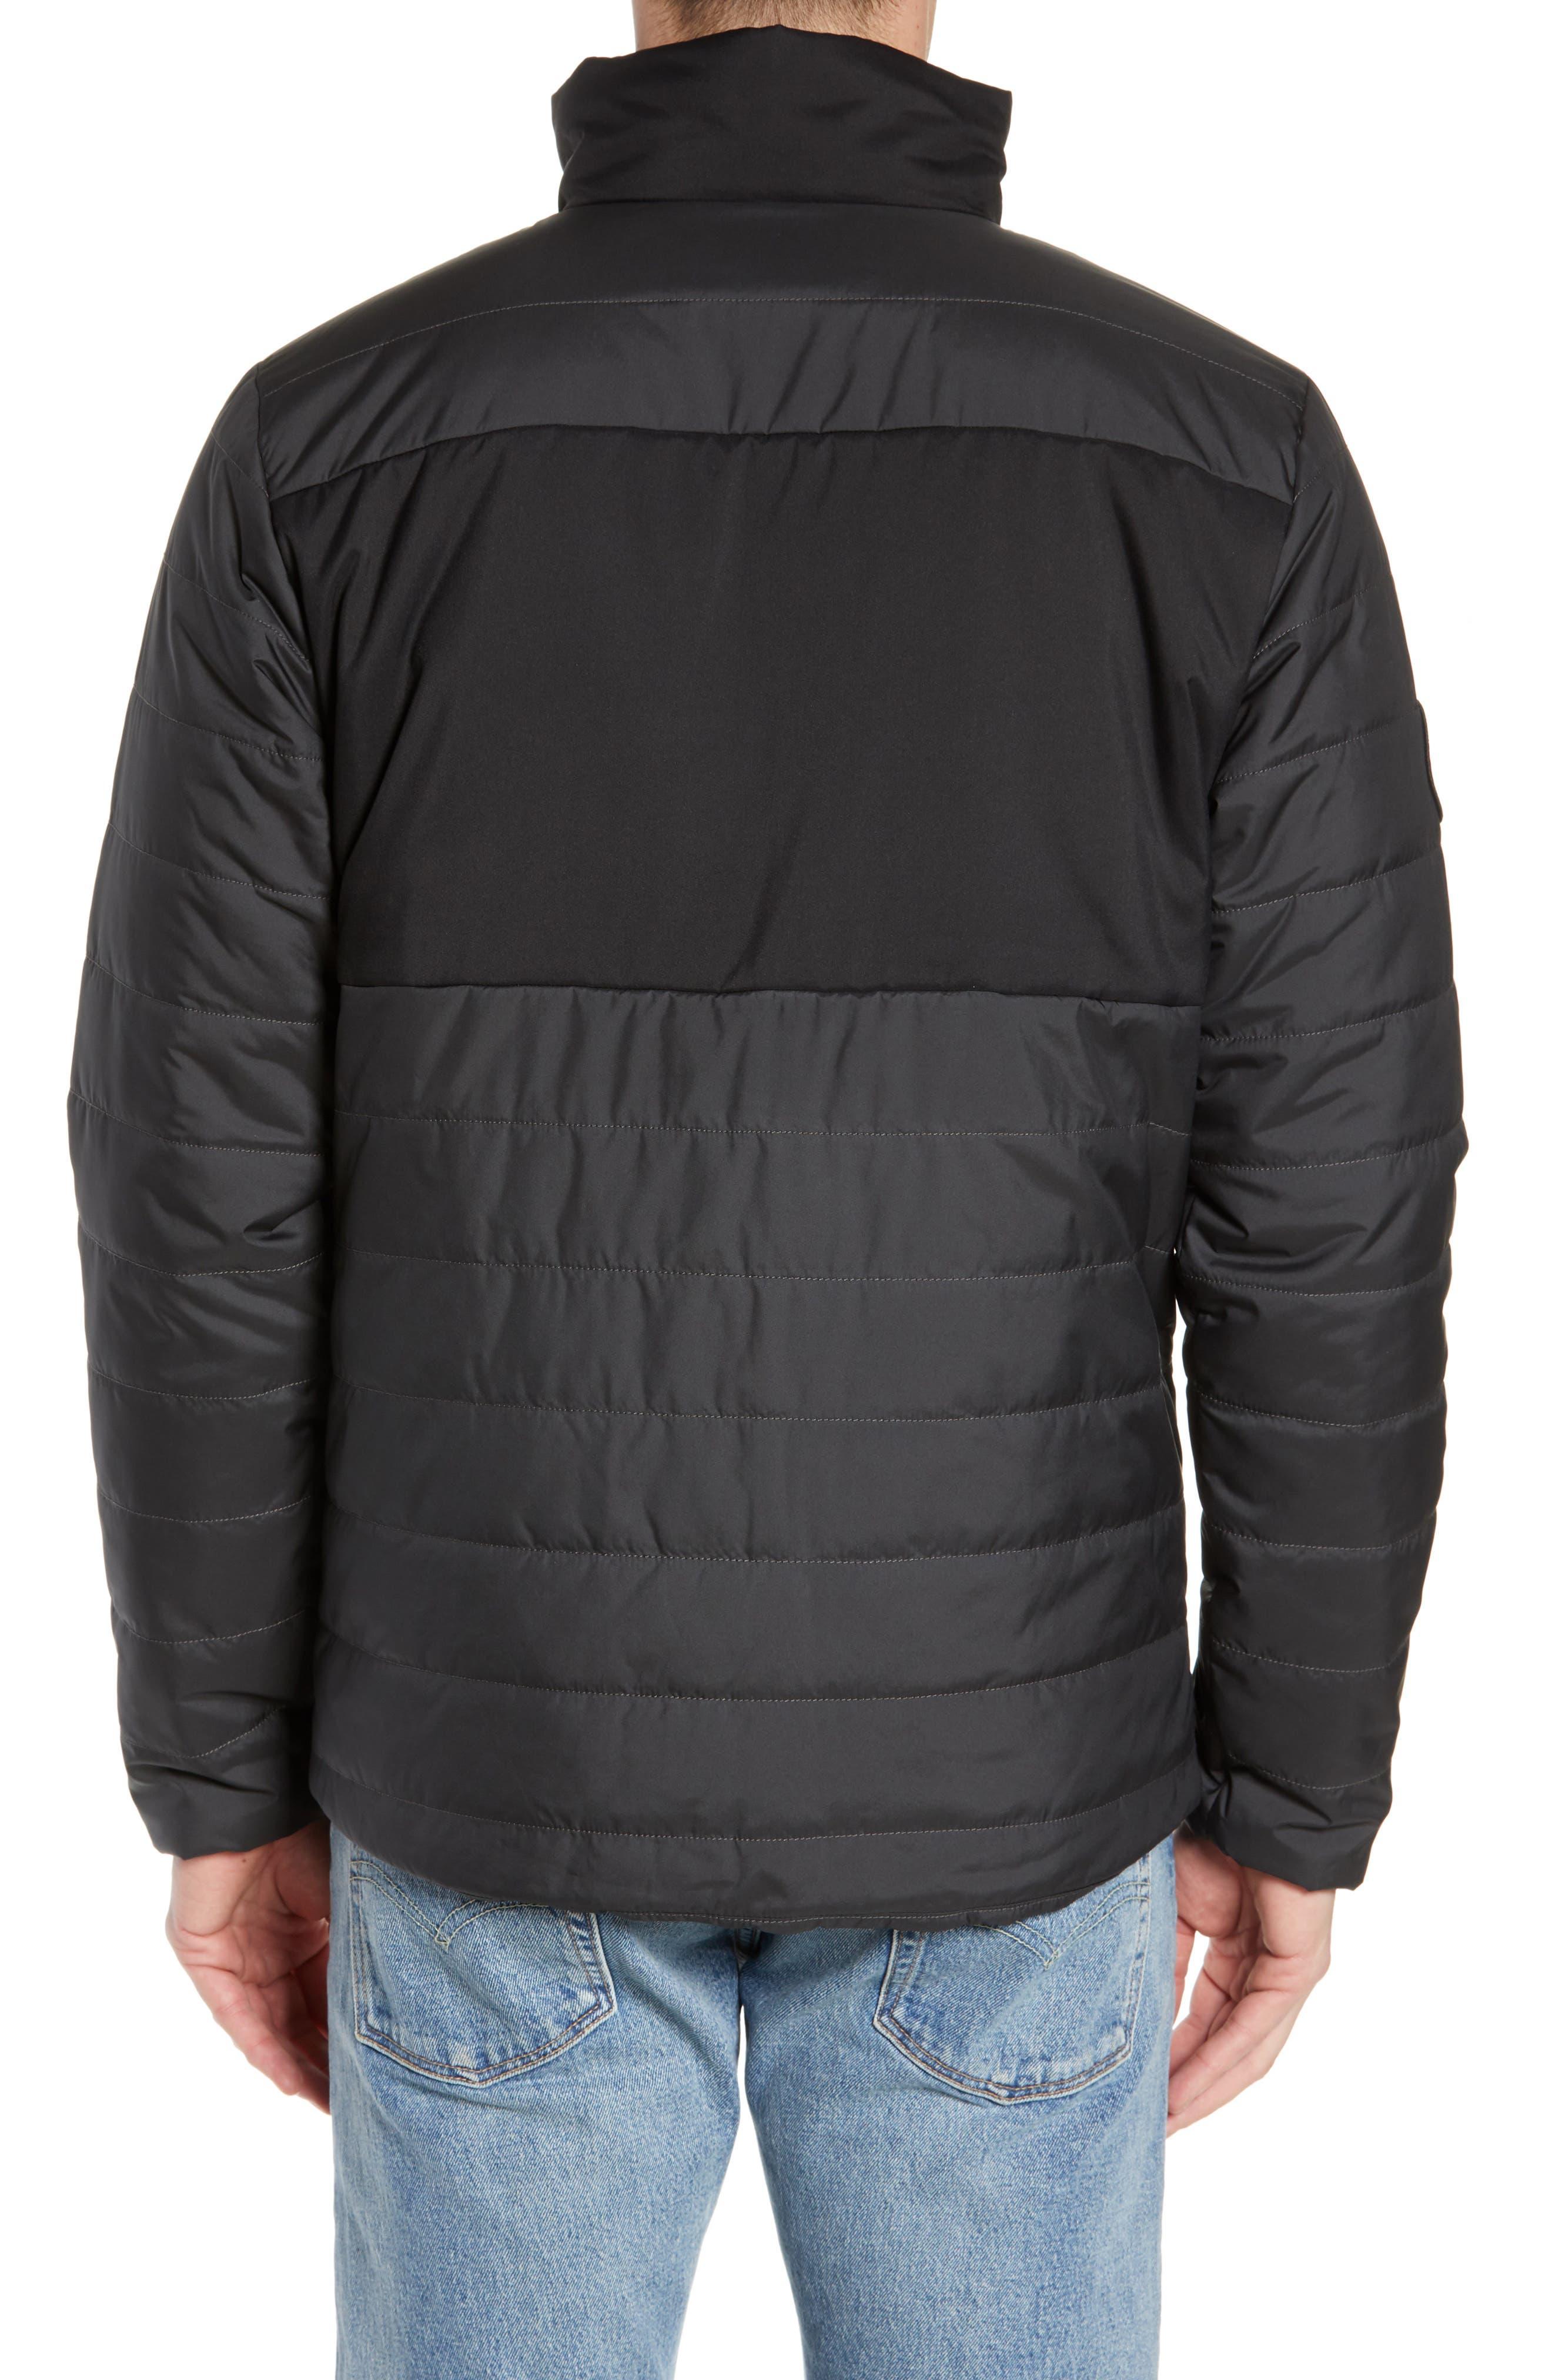 THE NORTH FACE, Insulated Jacket, Alternate thumbnail 2, color, TNF BLACK/ ASPHALT GREY